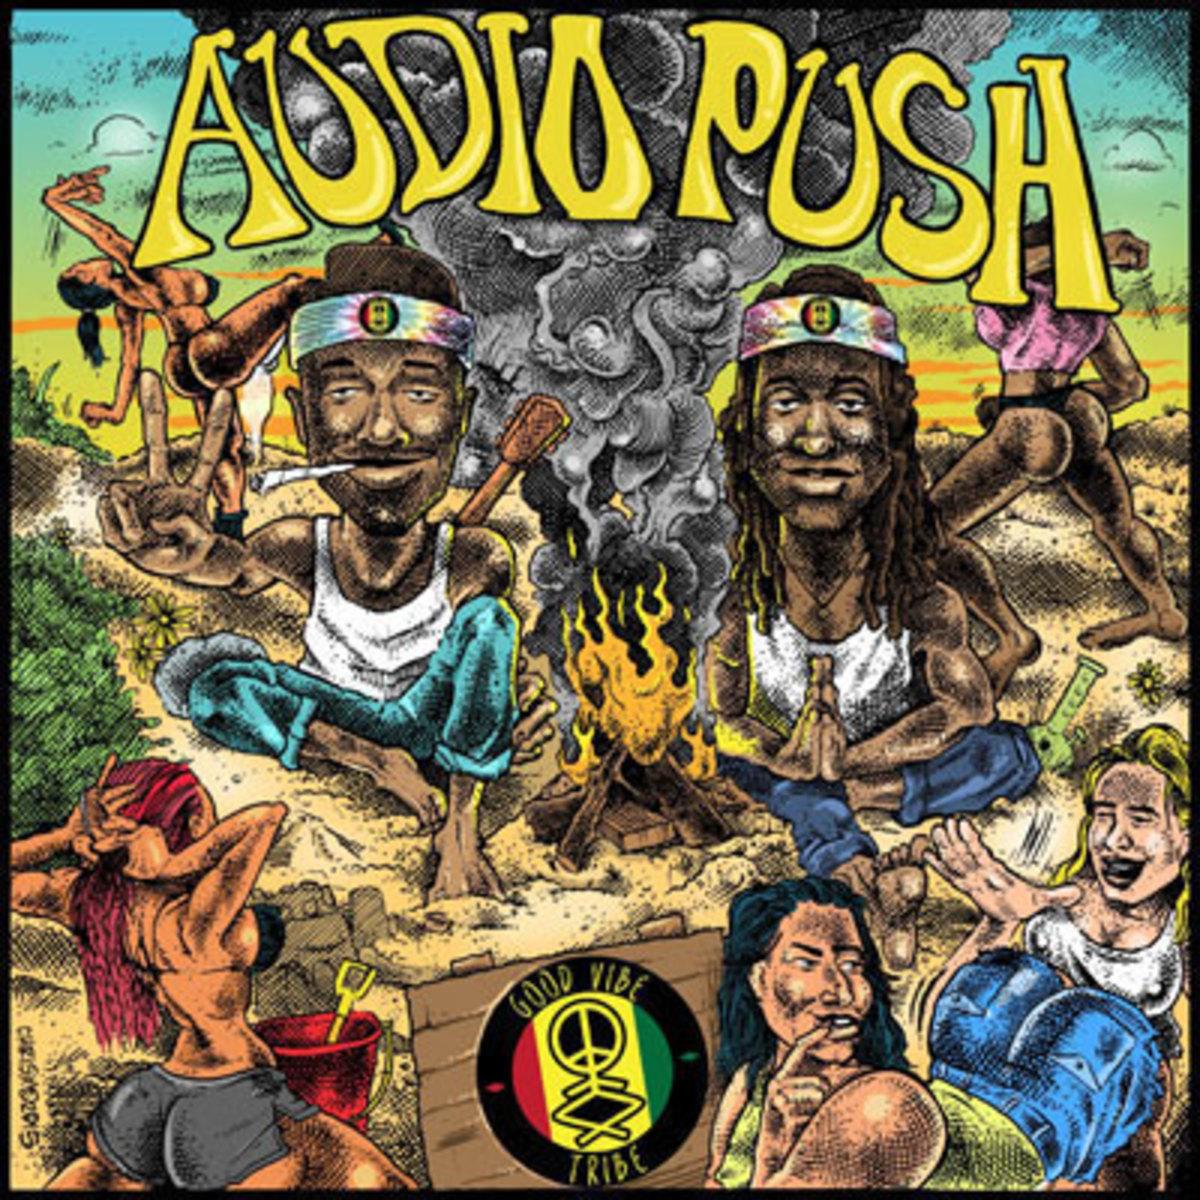 audio-push-good-vibe-tribe.jpg